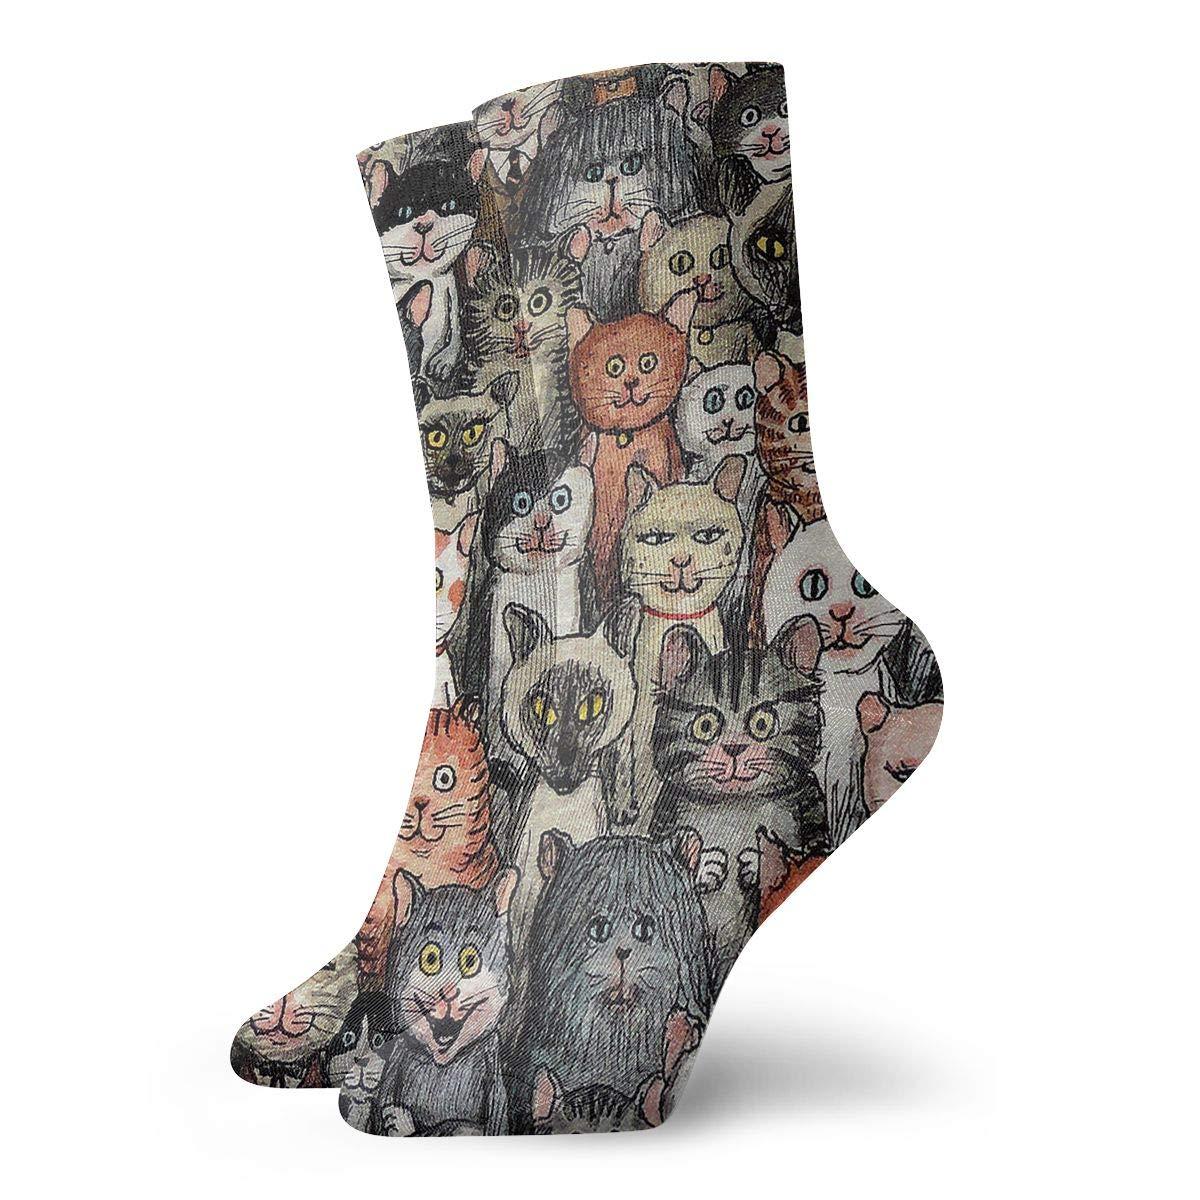 Cute Cartoon Cats Unisex Funny Casual Crew Socks Athletic Socks For Boys Girls Kids Teenagers